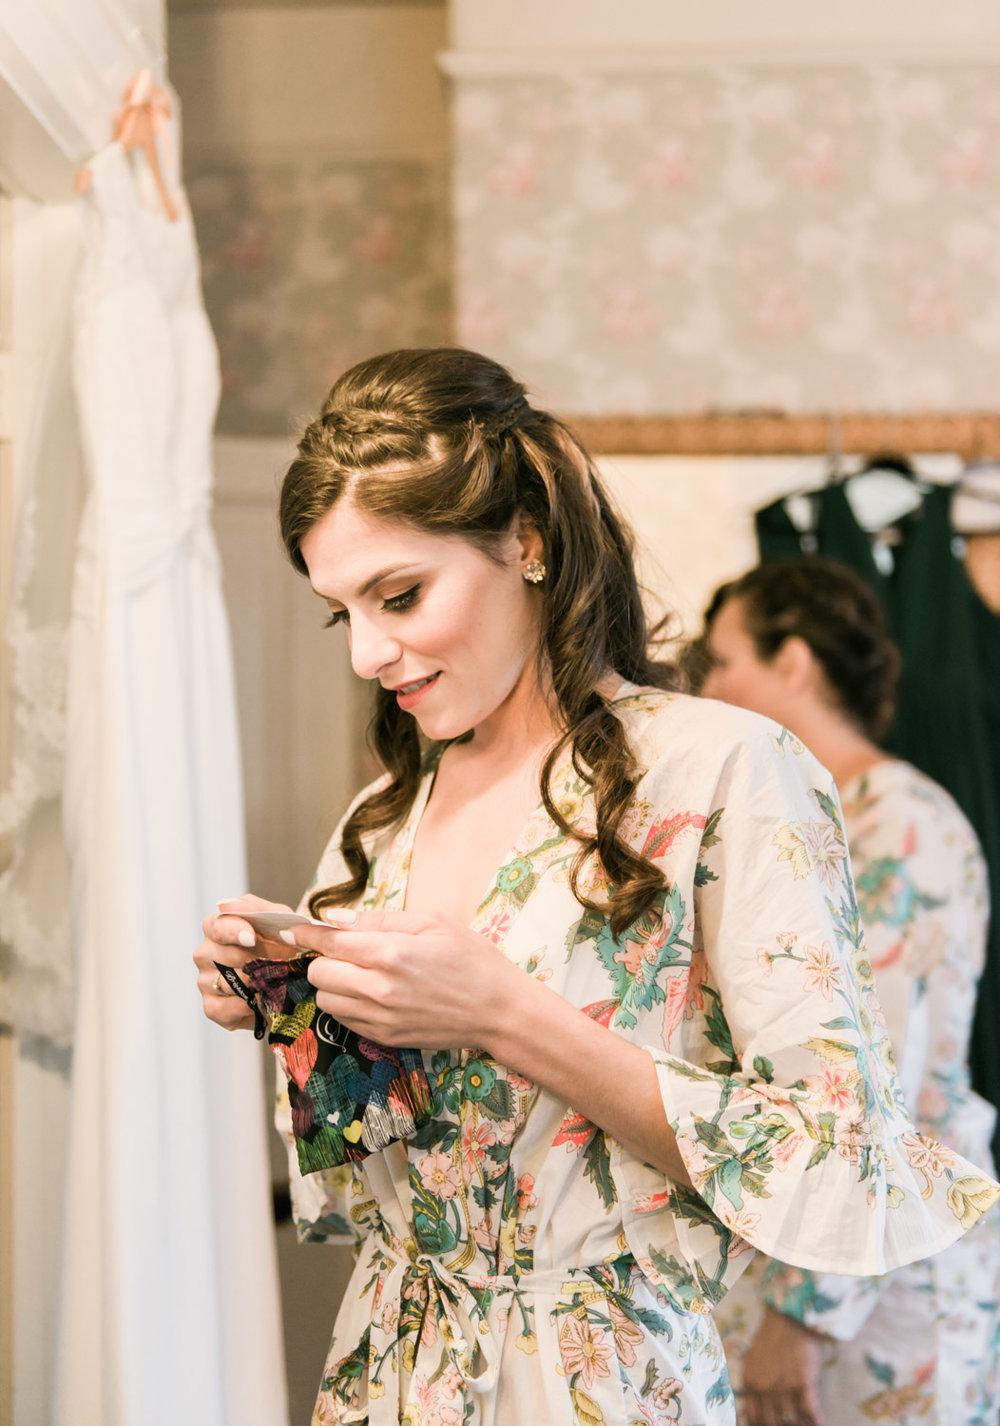 bride-emotional-wedding-venue-elliston-vineyard-photography-afewgoodclicks.net